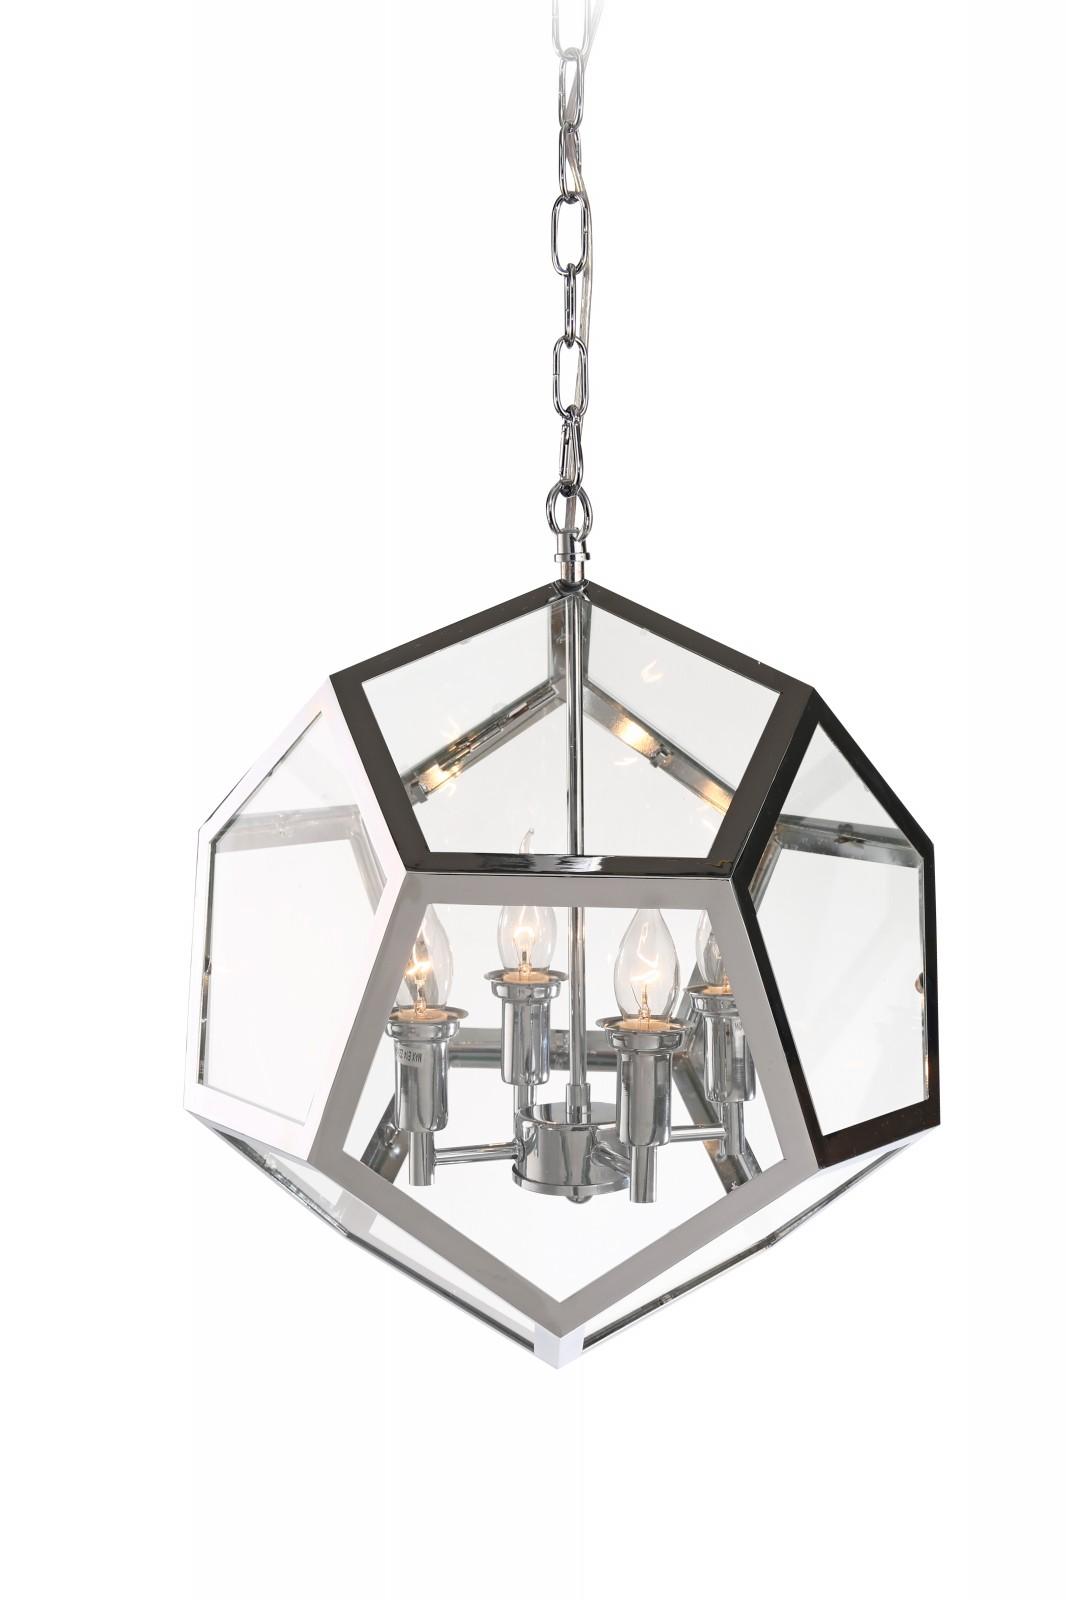 {} CRYSTAL LIGHT Подвесной светильник Buhara (40х40 см) crystal light светильник подвесной copacabana 20х40 см